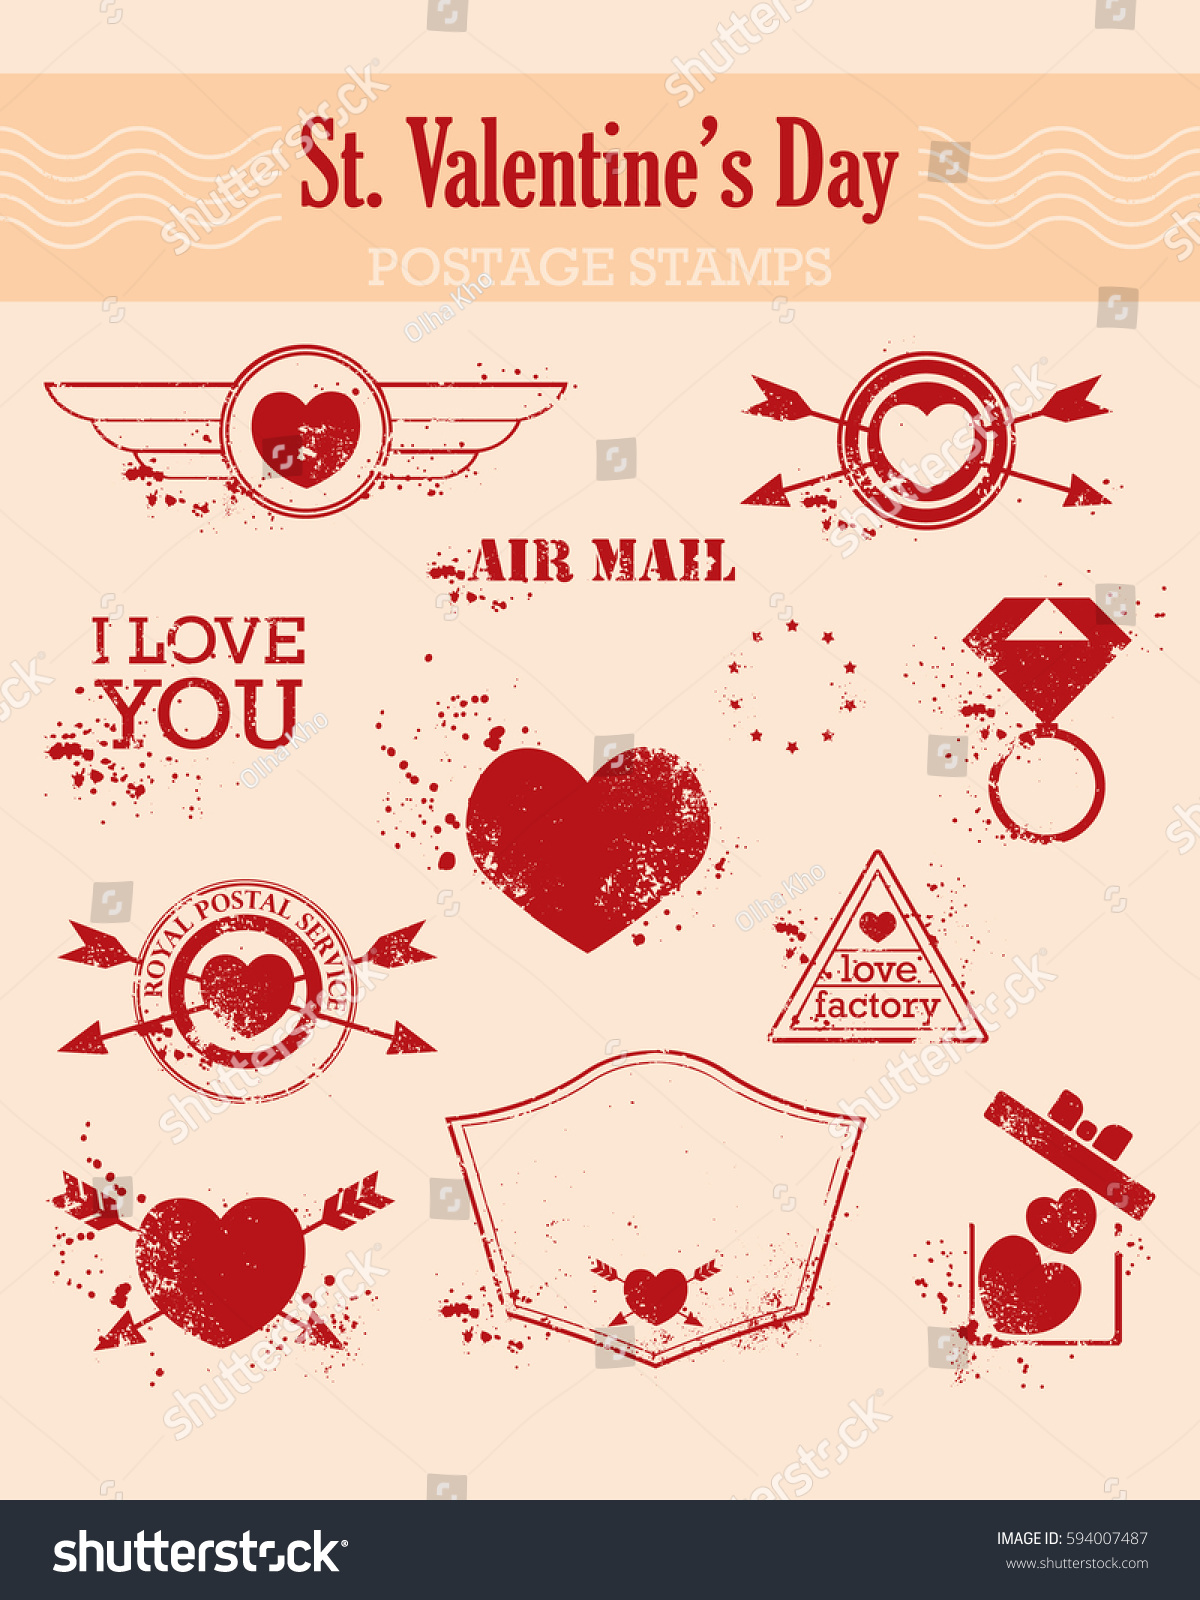 Set St Valentine S Day Postagestamps Vintage Stock Vector (Royalty ...